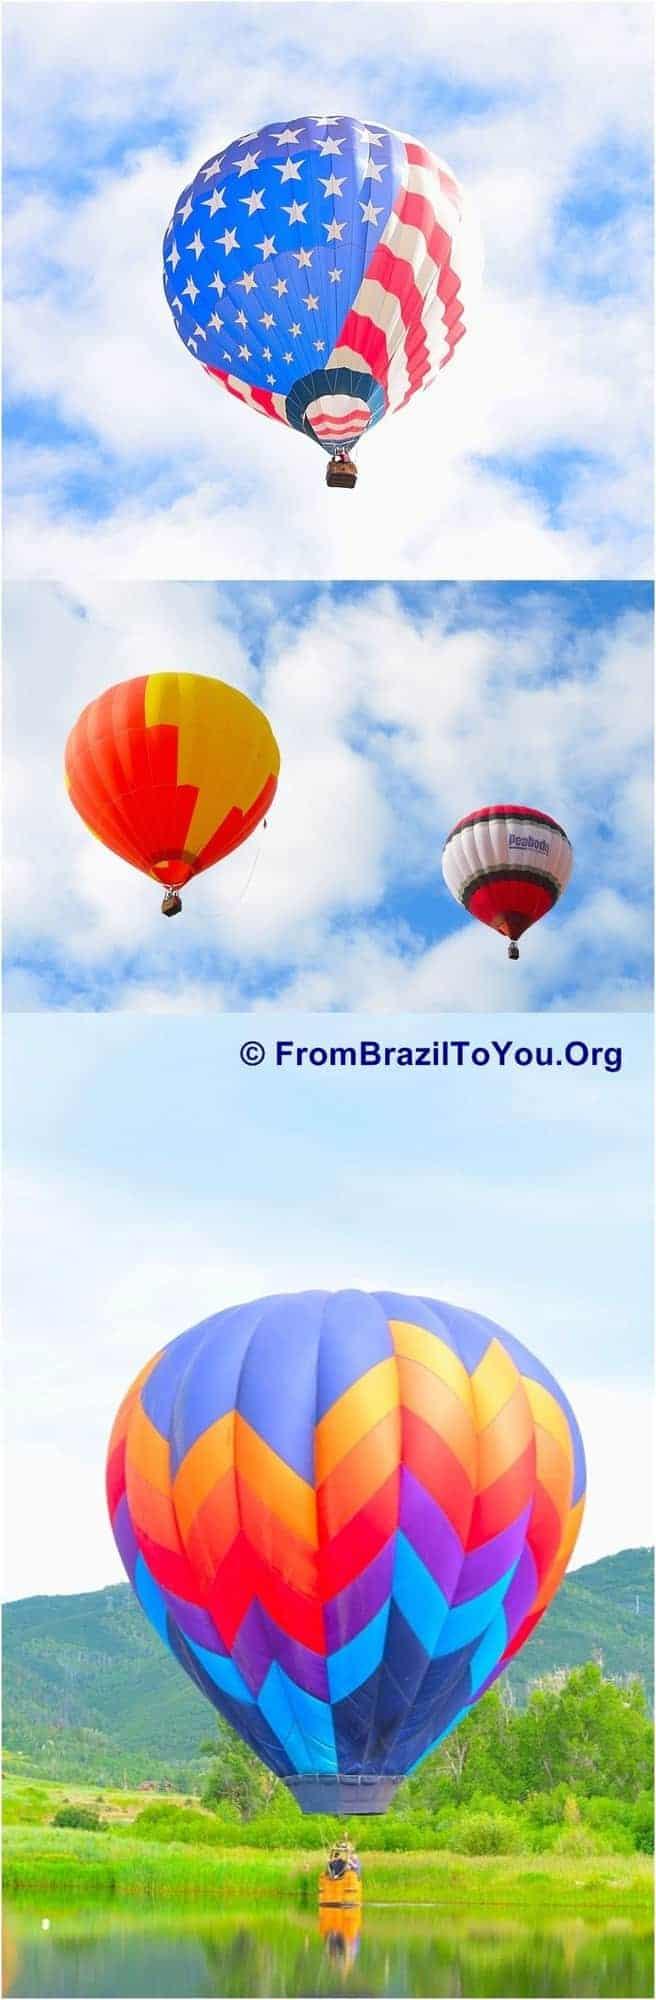 Hot Air Ballon Festival in Steam Boat Springs, Colorado.